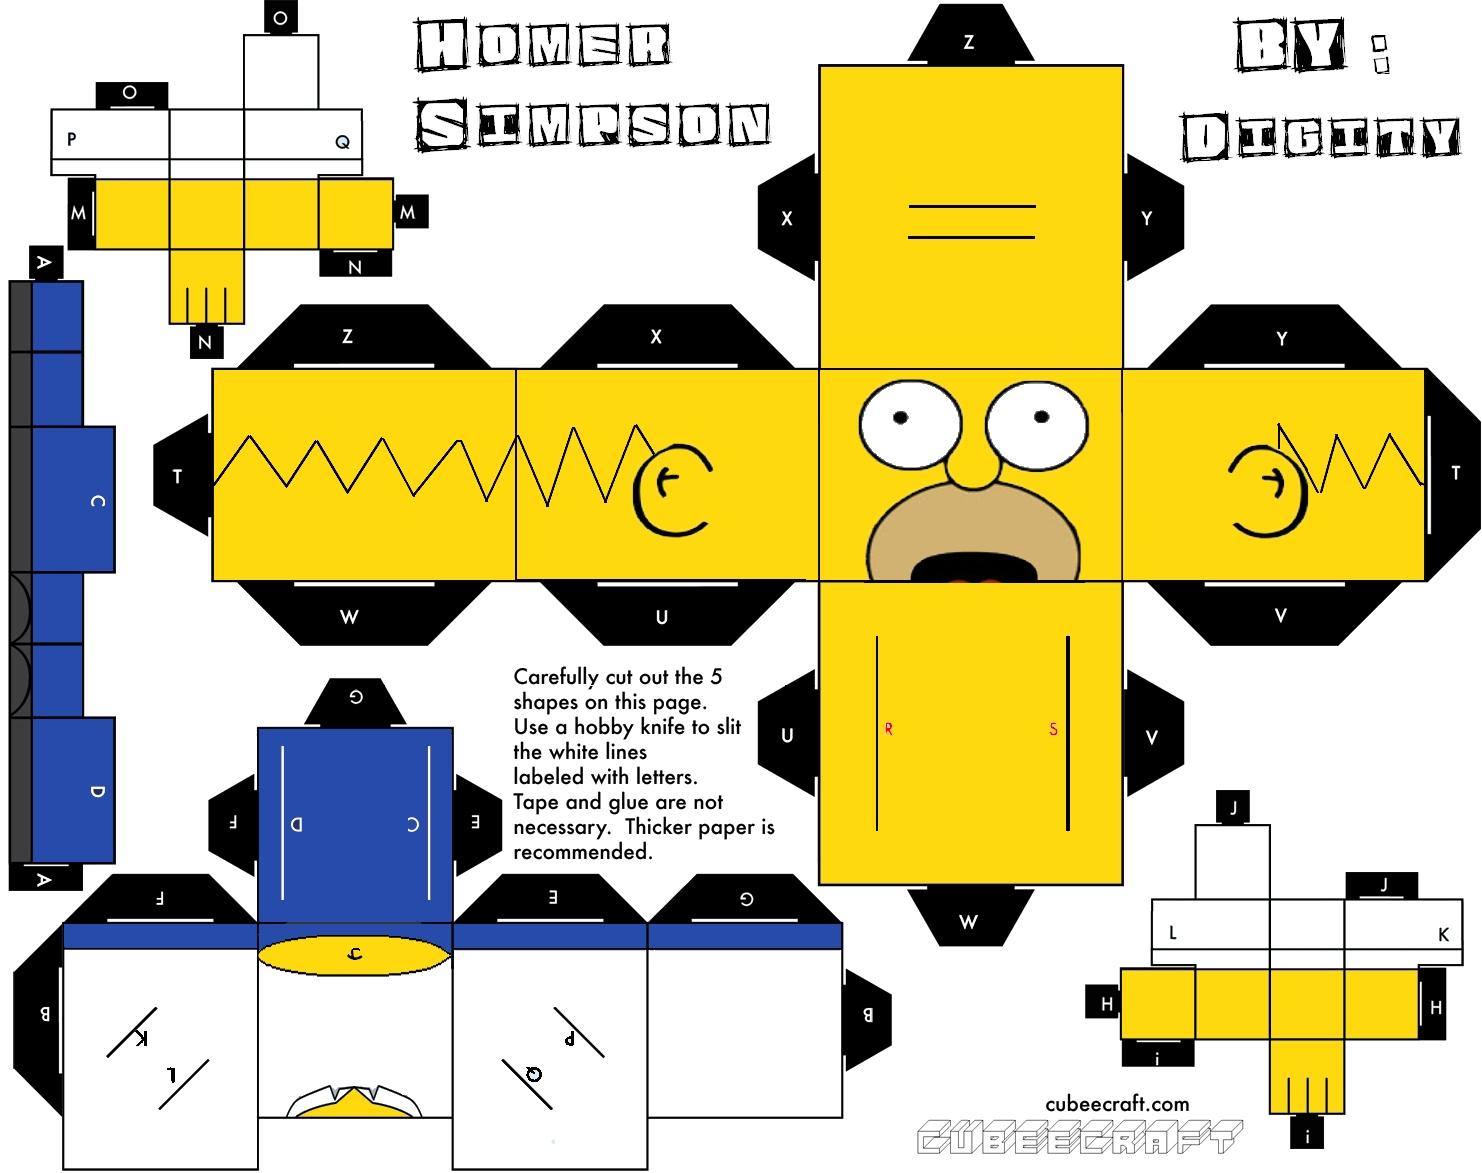 Paper_craft_Homer_simpson_by_Digity.jpg